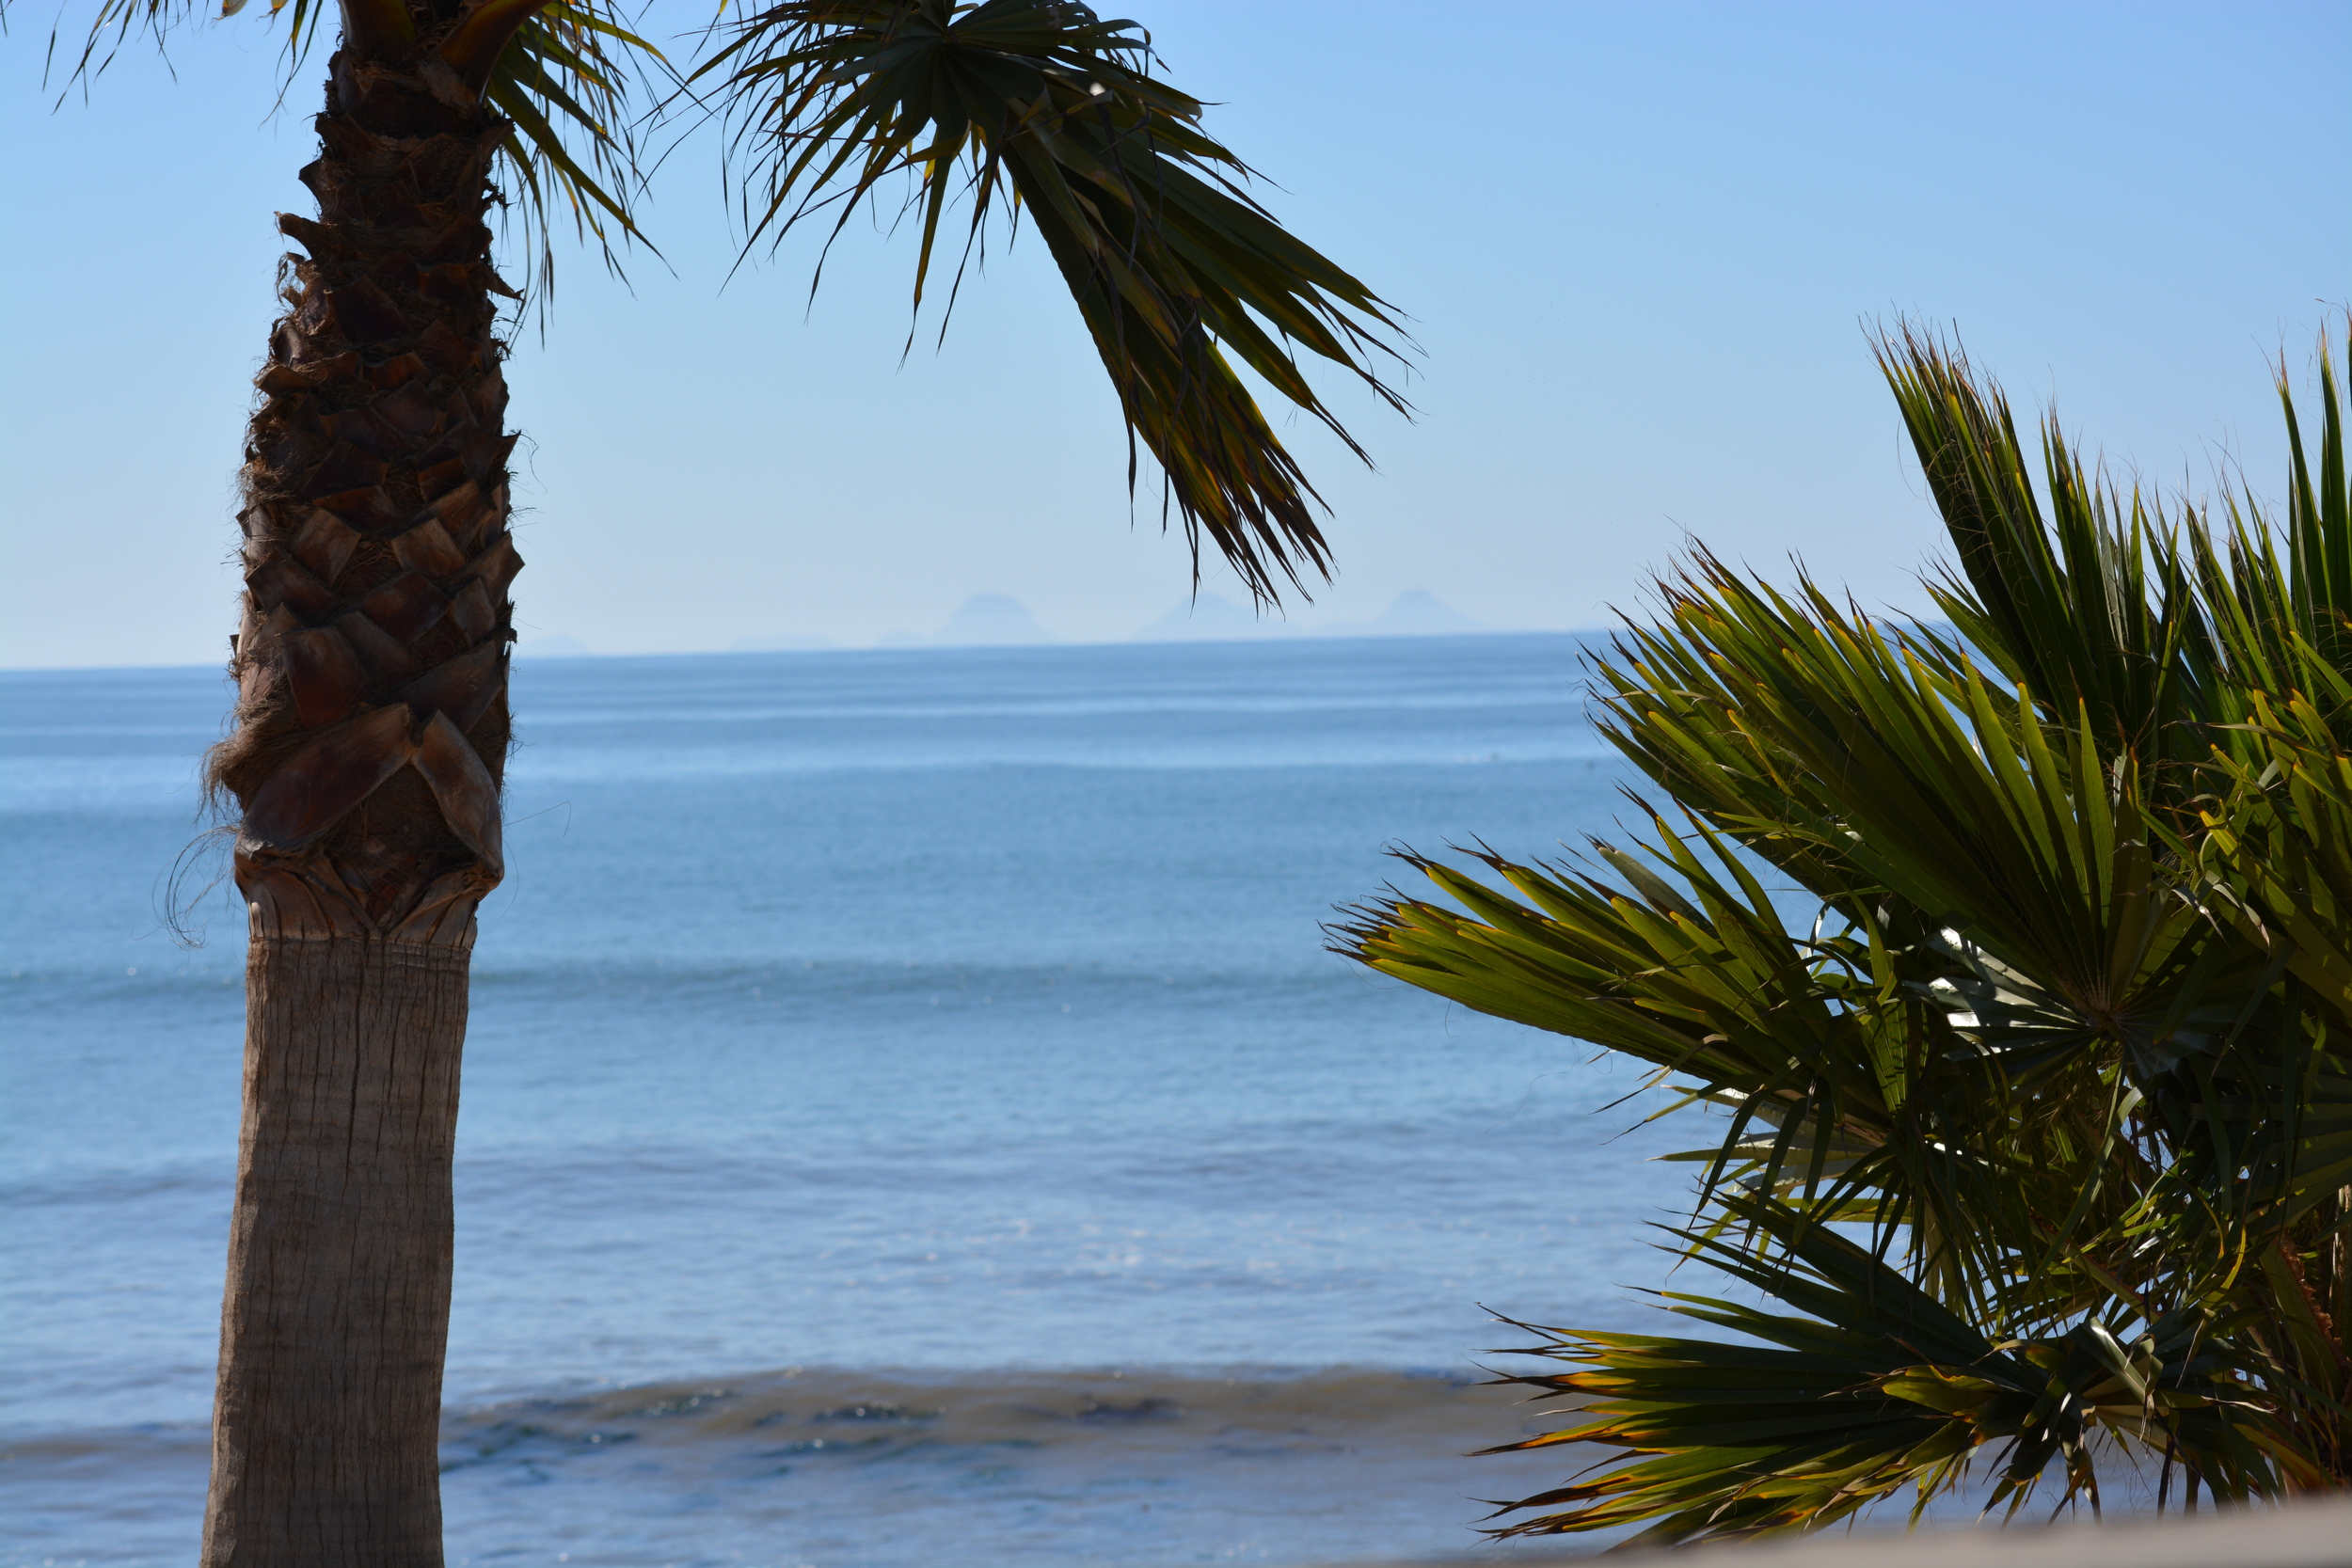 Baja California 10-5-13 Shipwrecks Surfing Adventure Ocean Experience Surf School San Diego (51).JPG